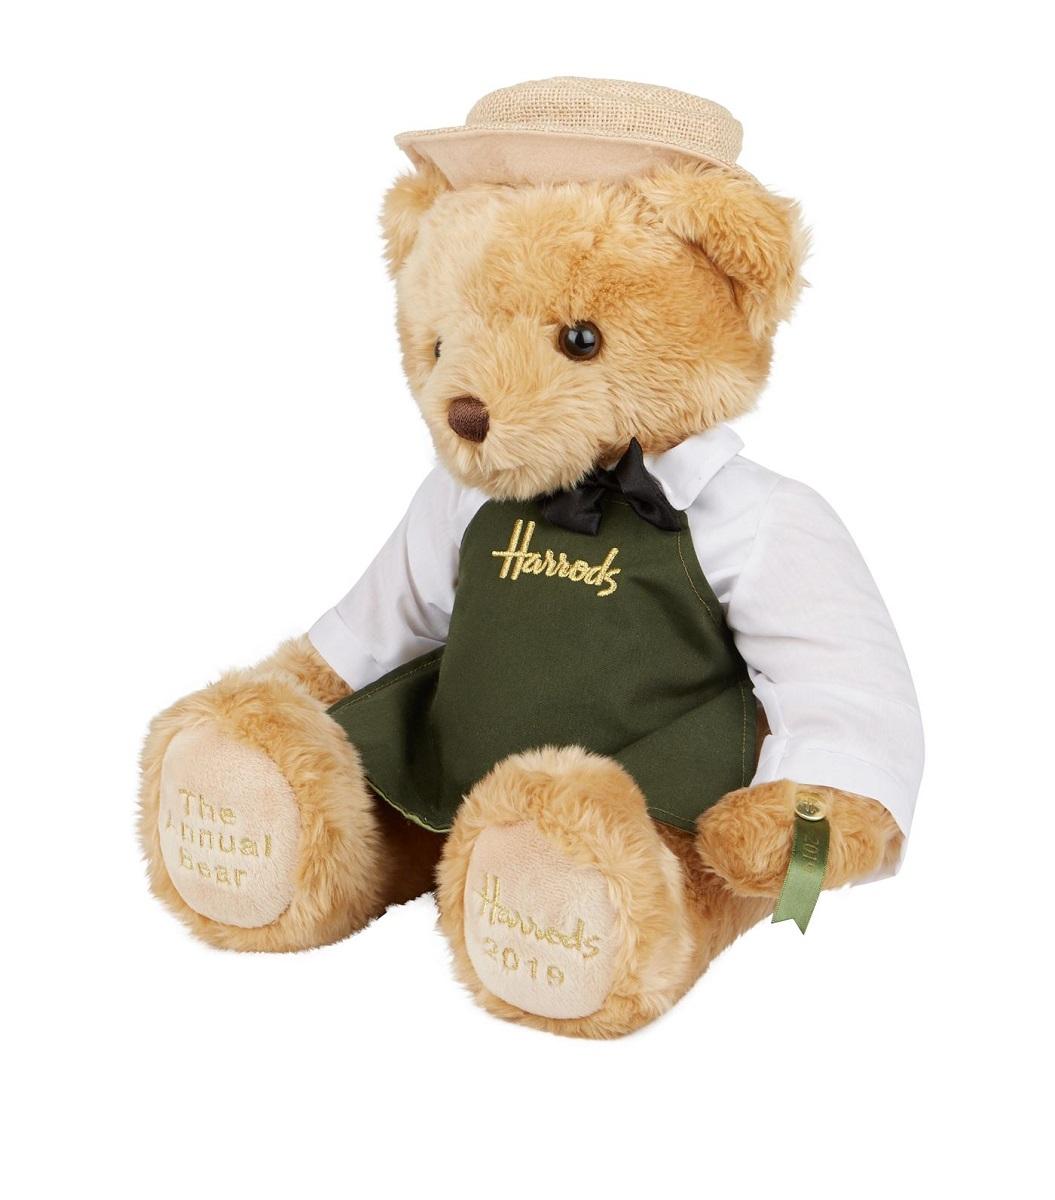 【Harrods year bear Annual Bear Grocer 2019  】アニュアル ベア グローサー 2019 spring ハロッズ イヤーベア 2019年 Harrods ディスプレイボックス入り(本州)